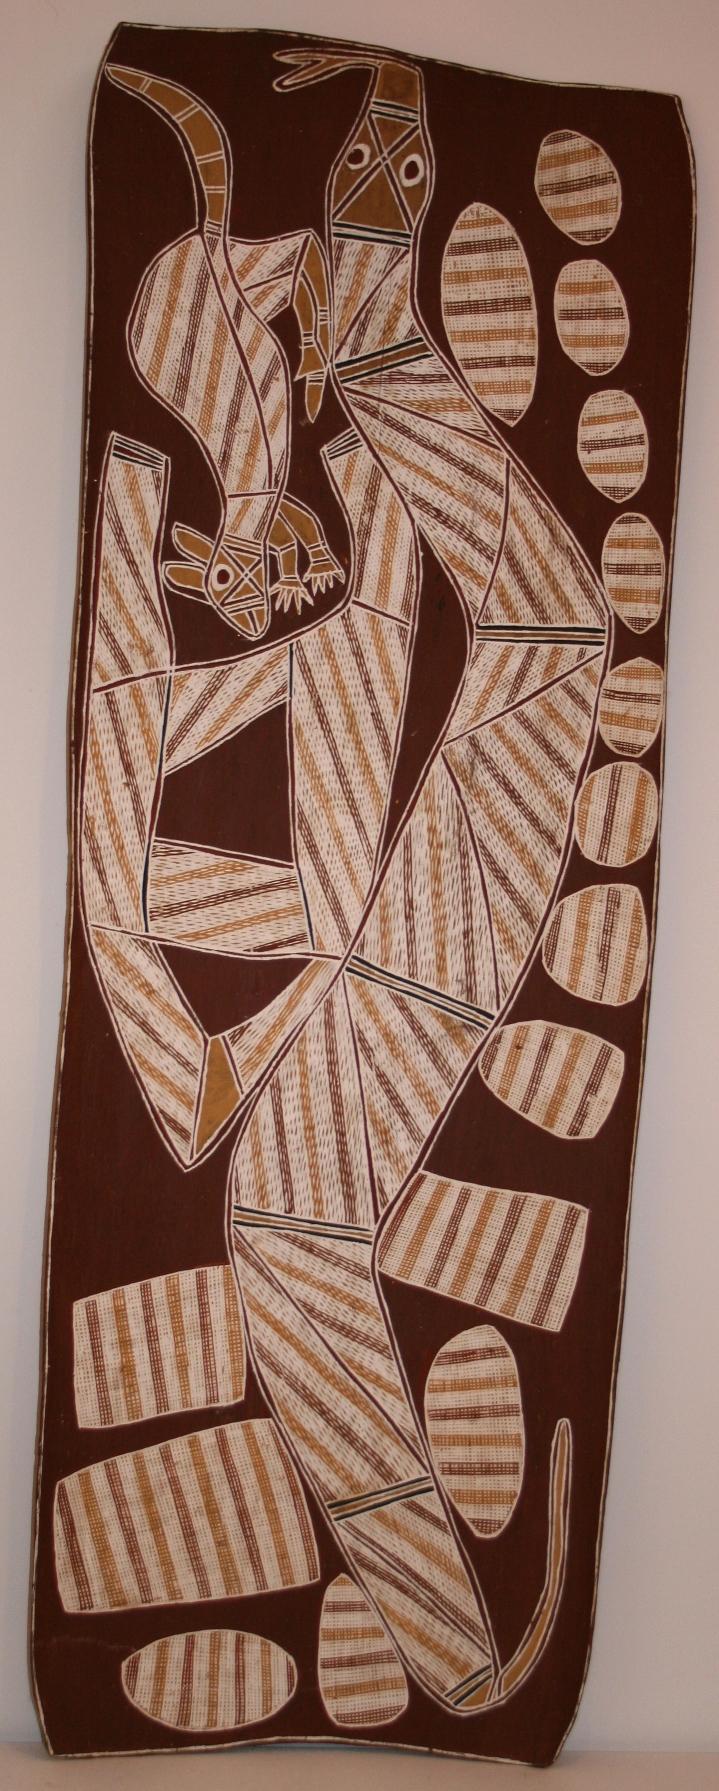 7-england bangala (54 x 153cm).jpg